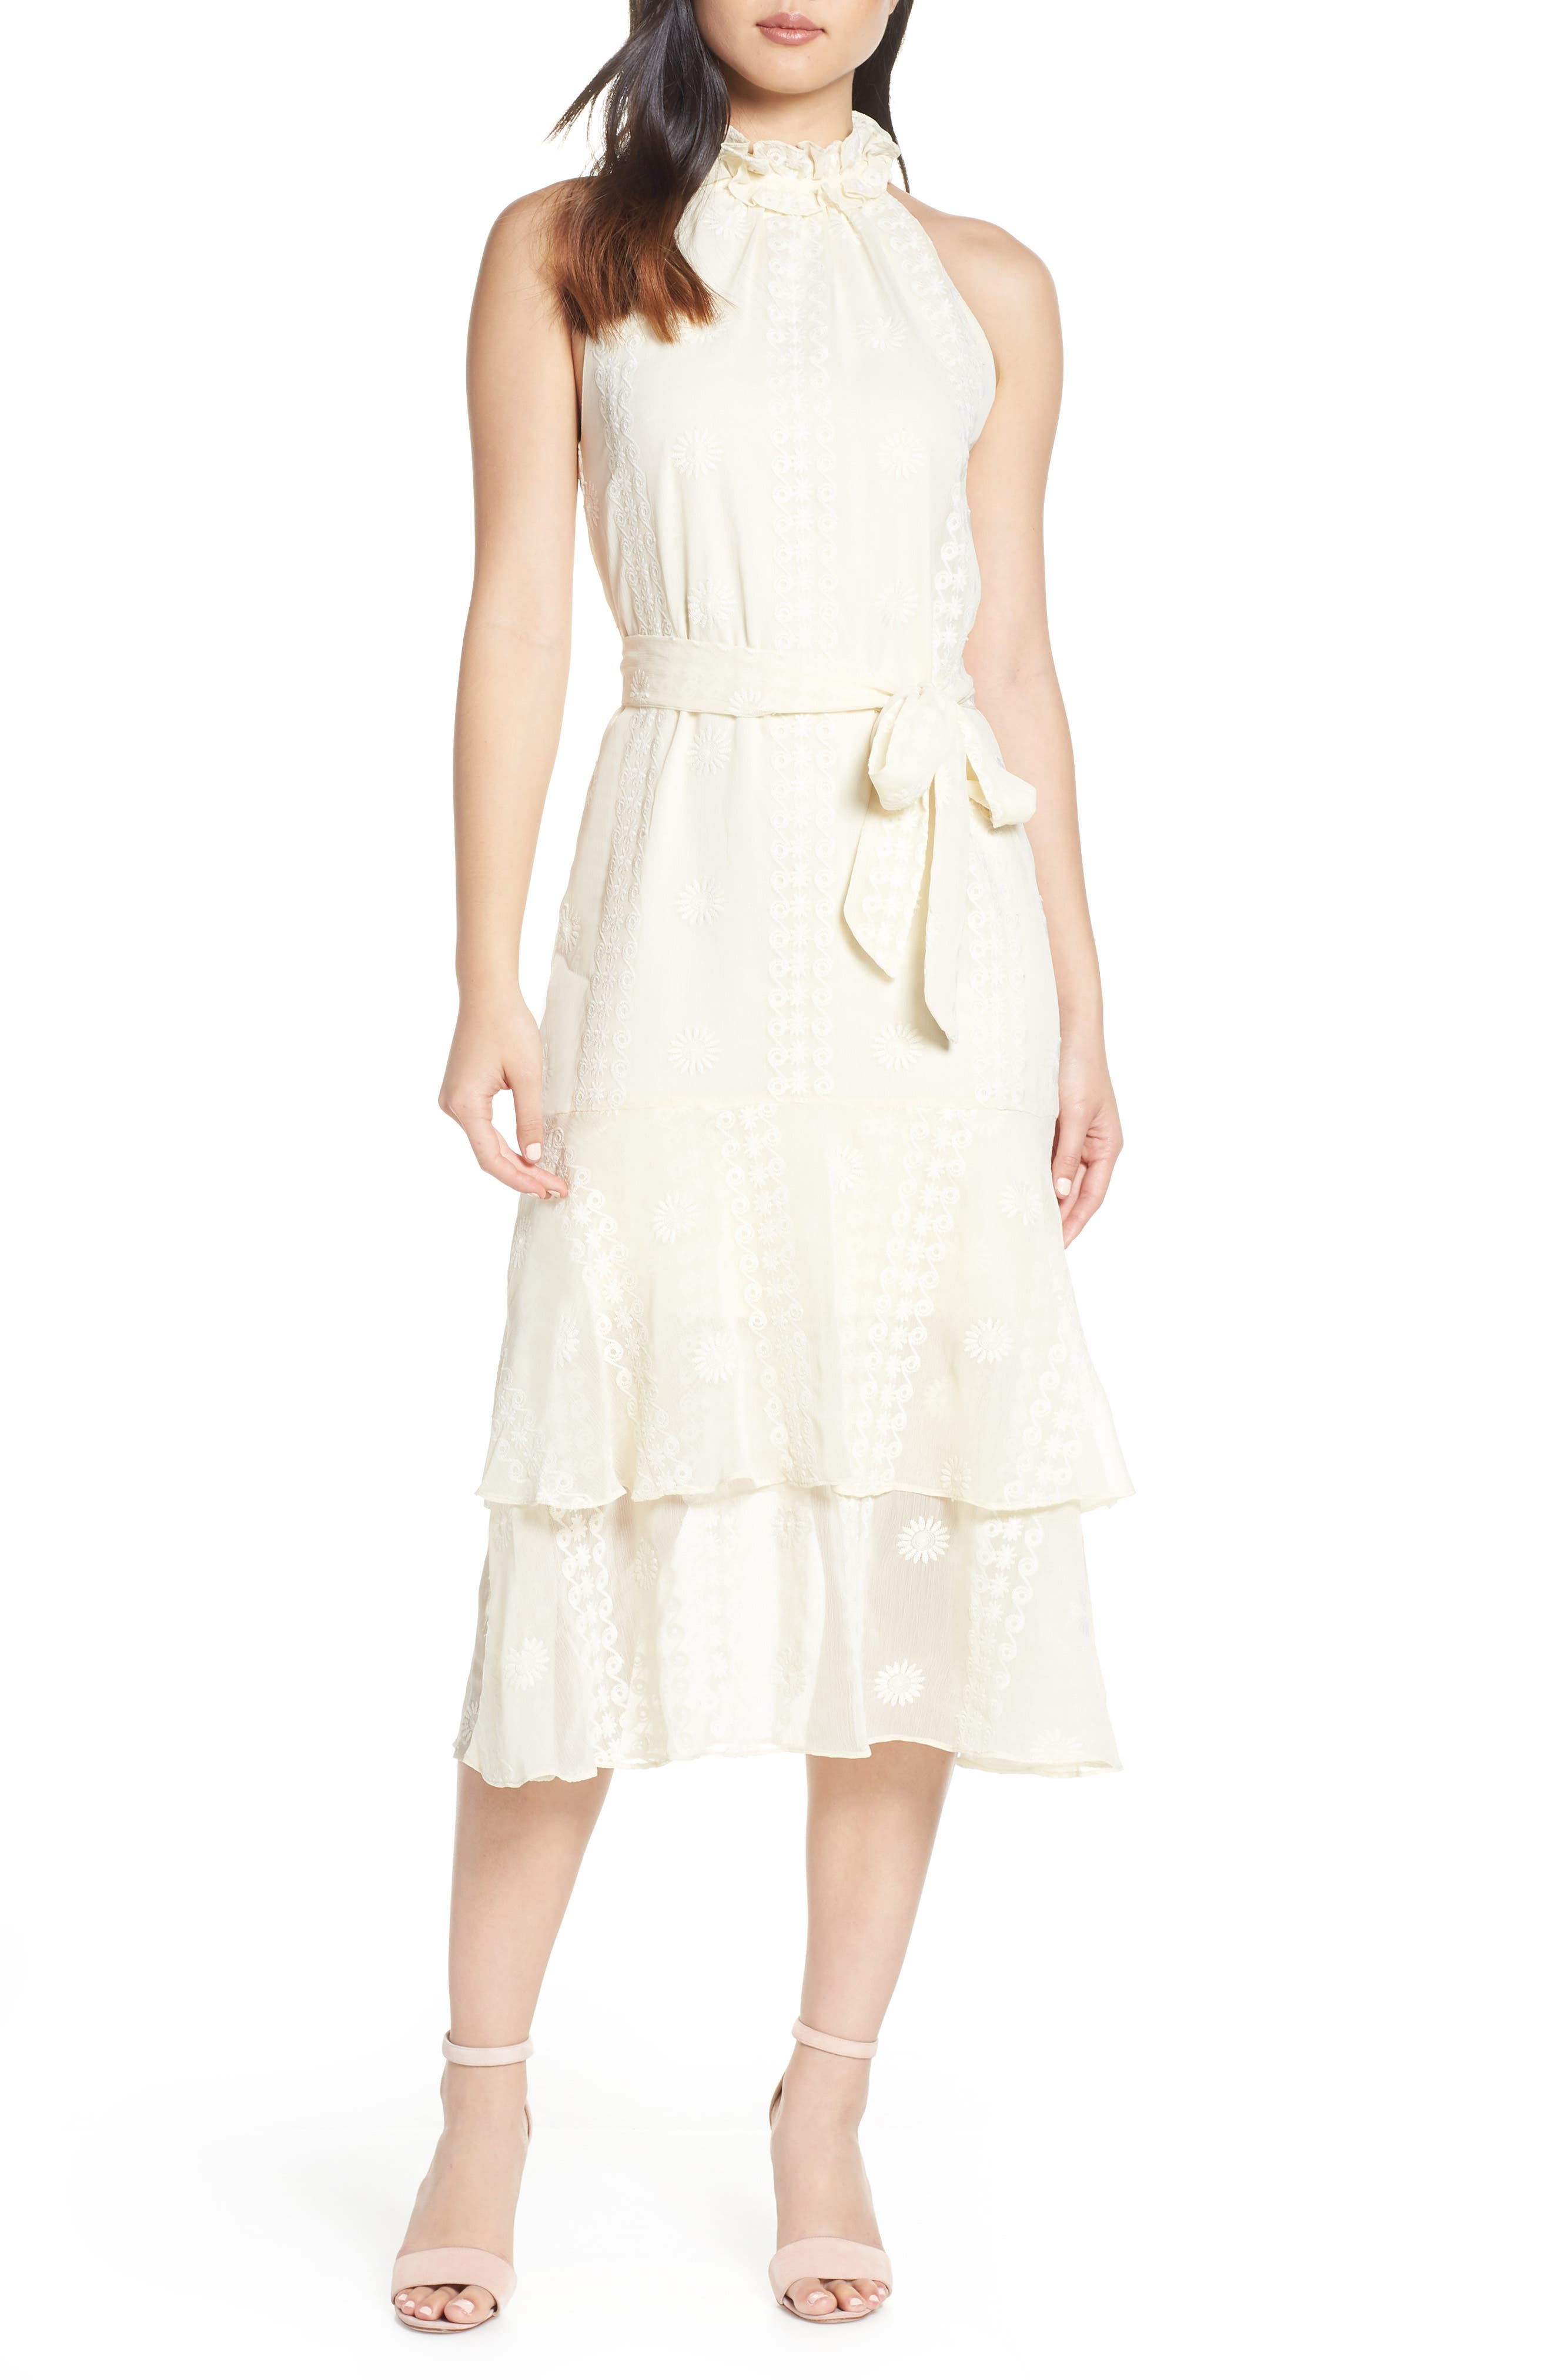 Cooper St Maiden High Neck Midi Dress, Ivory